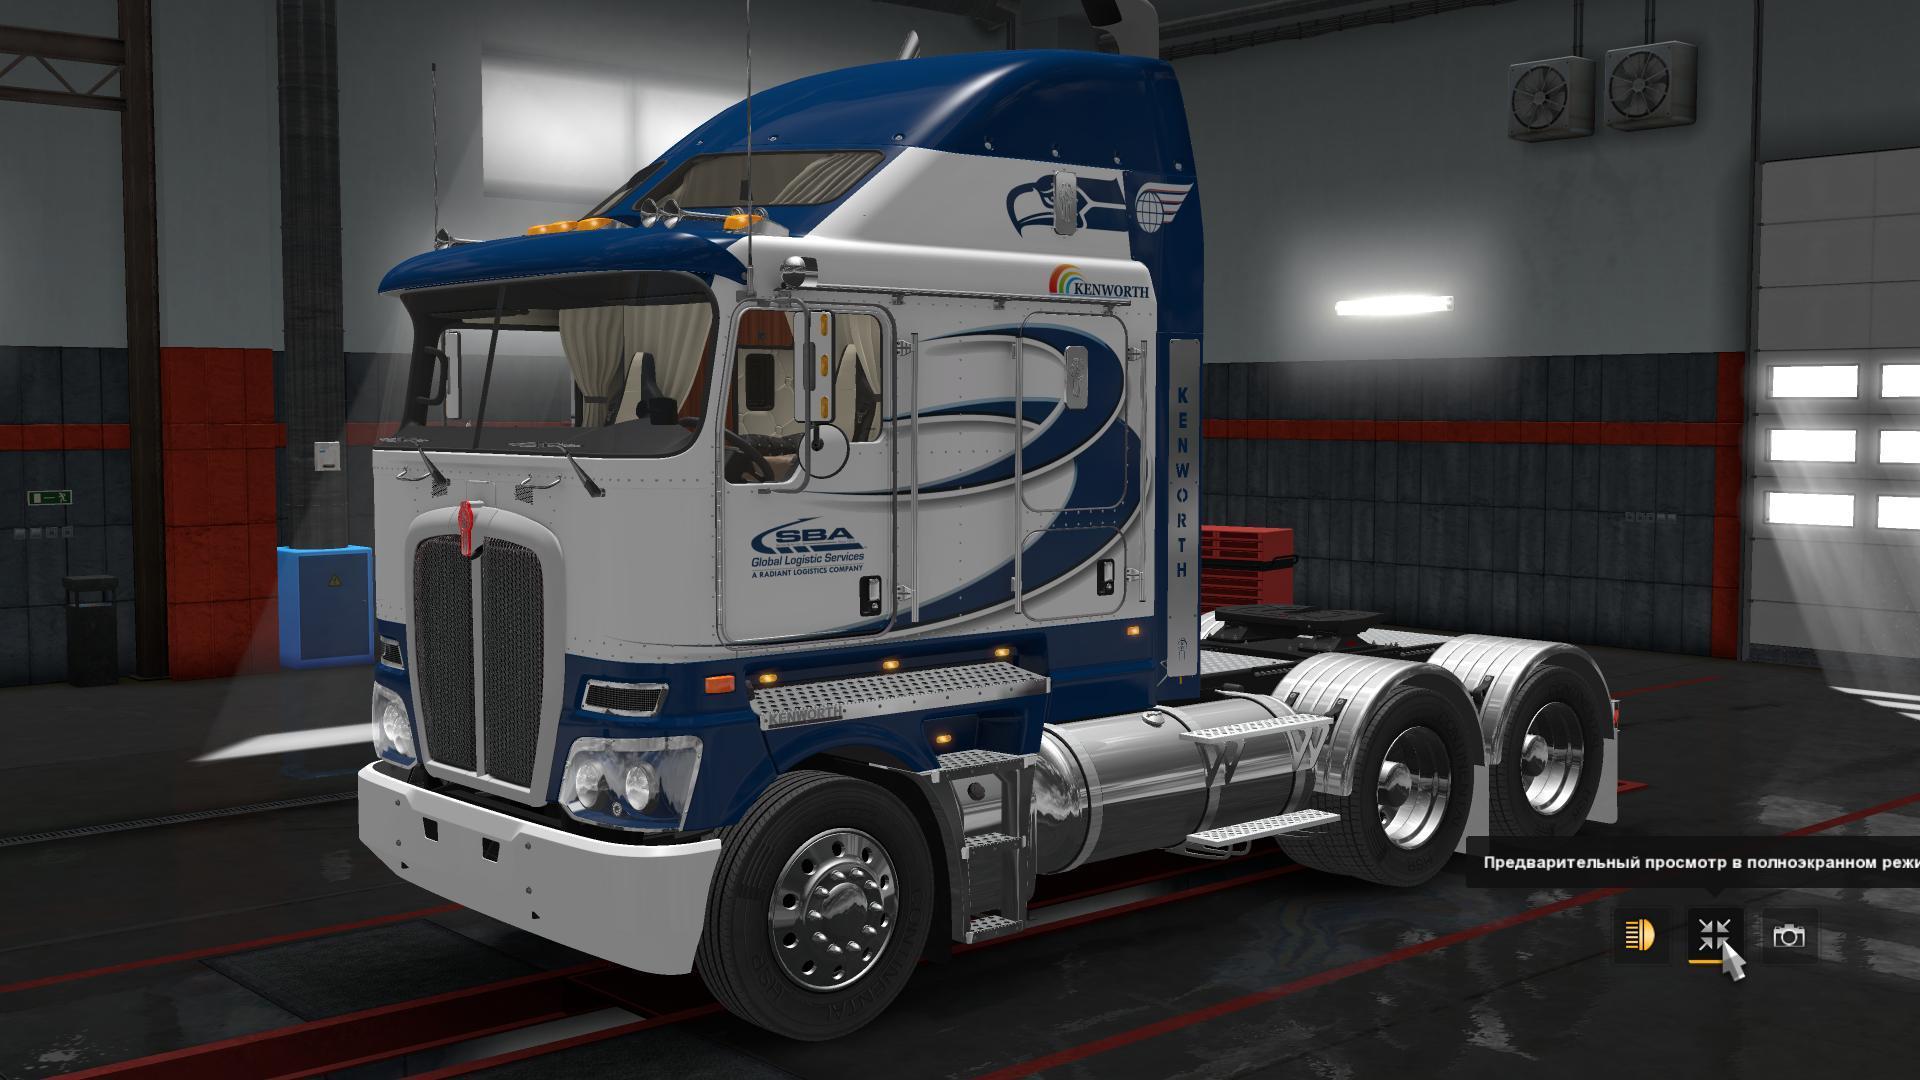 Kenworth K200 Sba Truck Skin 1 30